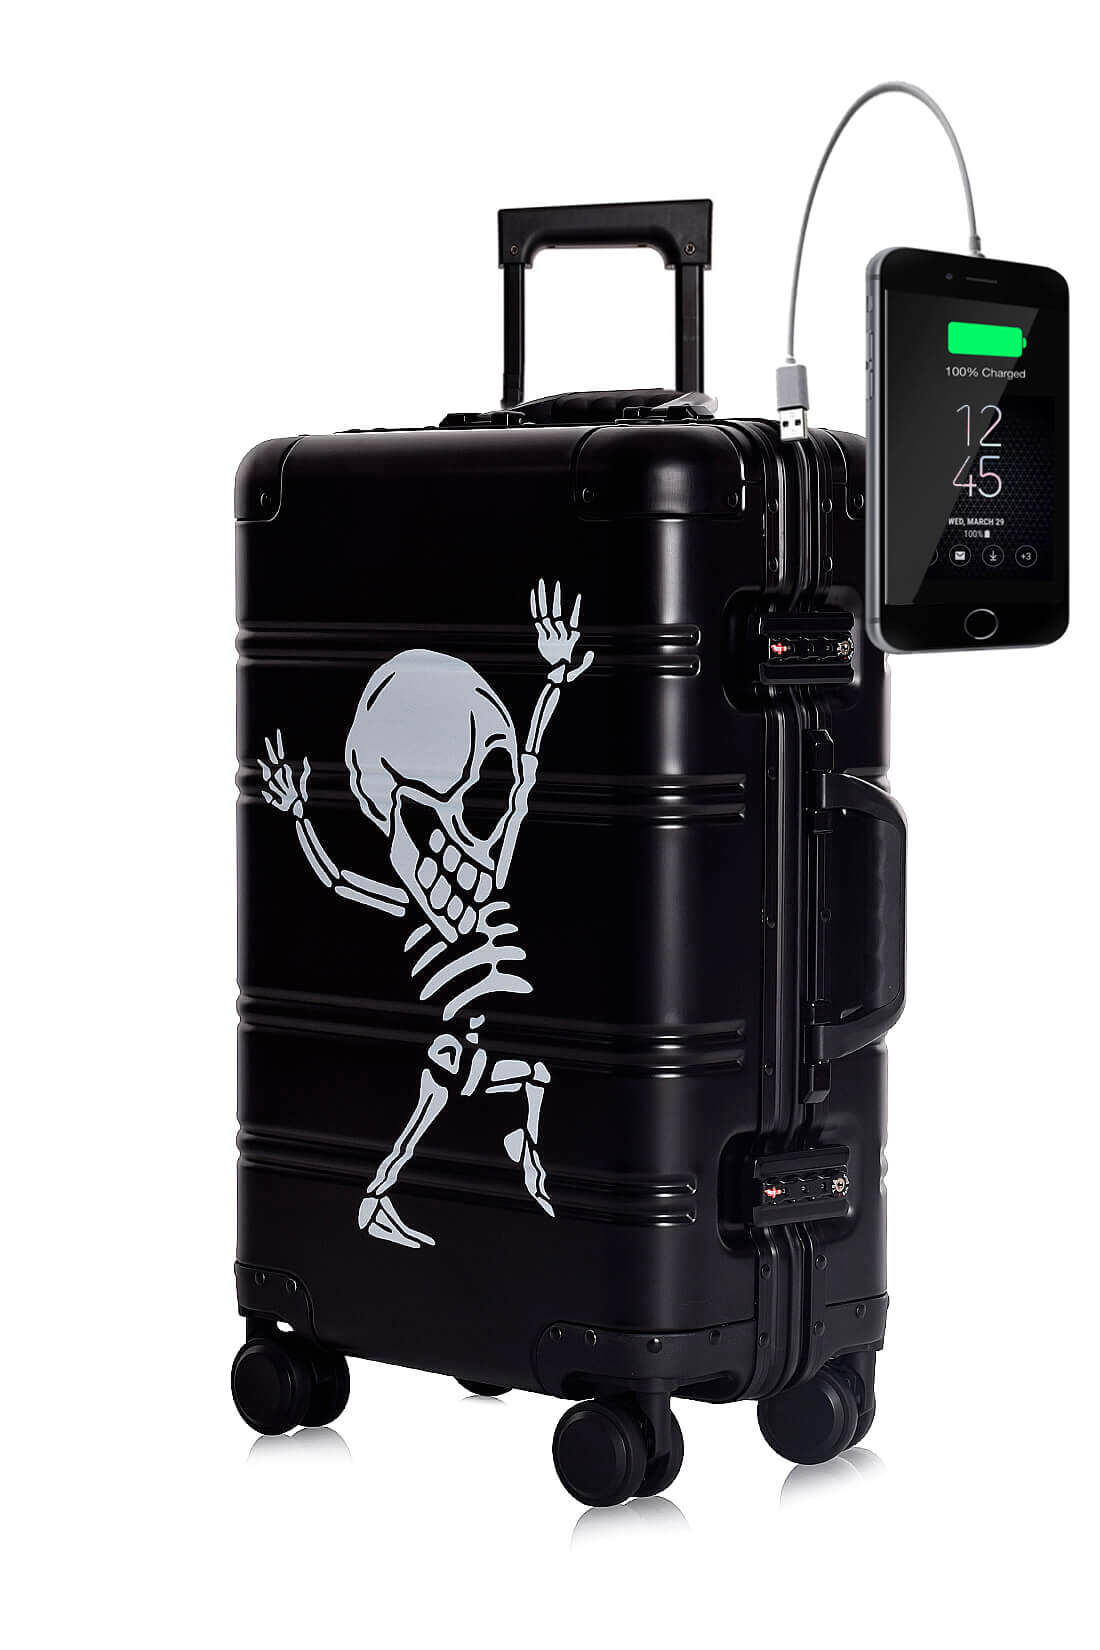 Aluminium Valise Online Cabine Trolley TOKYOTO LUGGAGE Modelle Black Skull